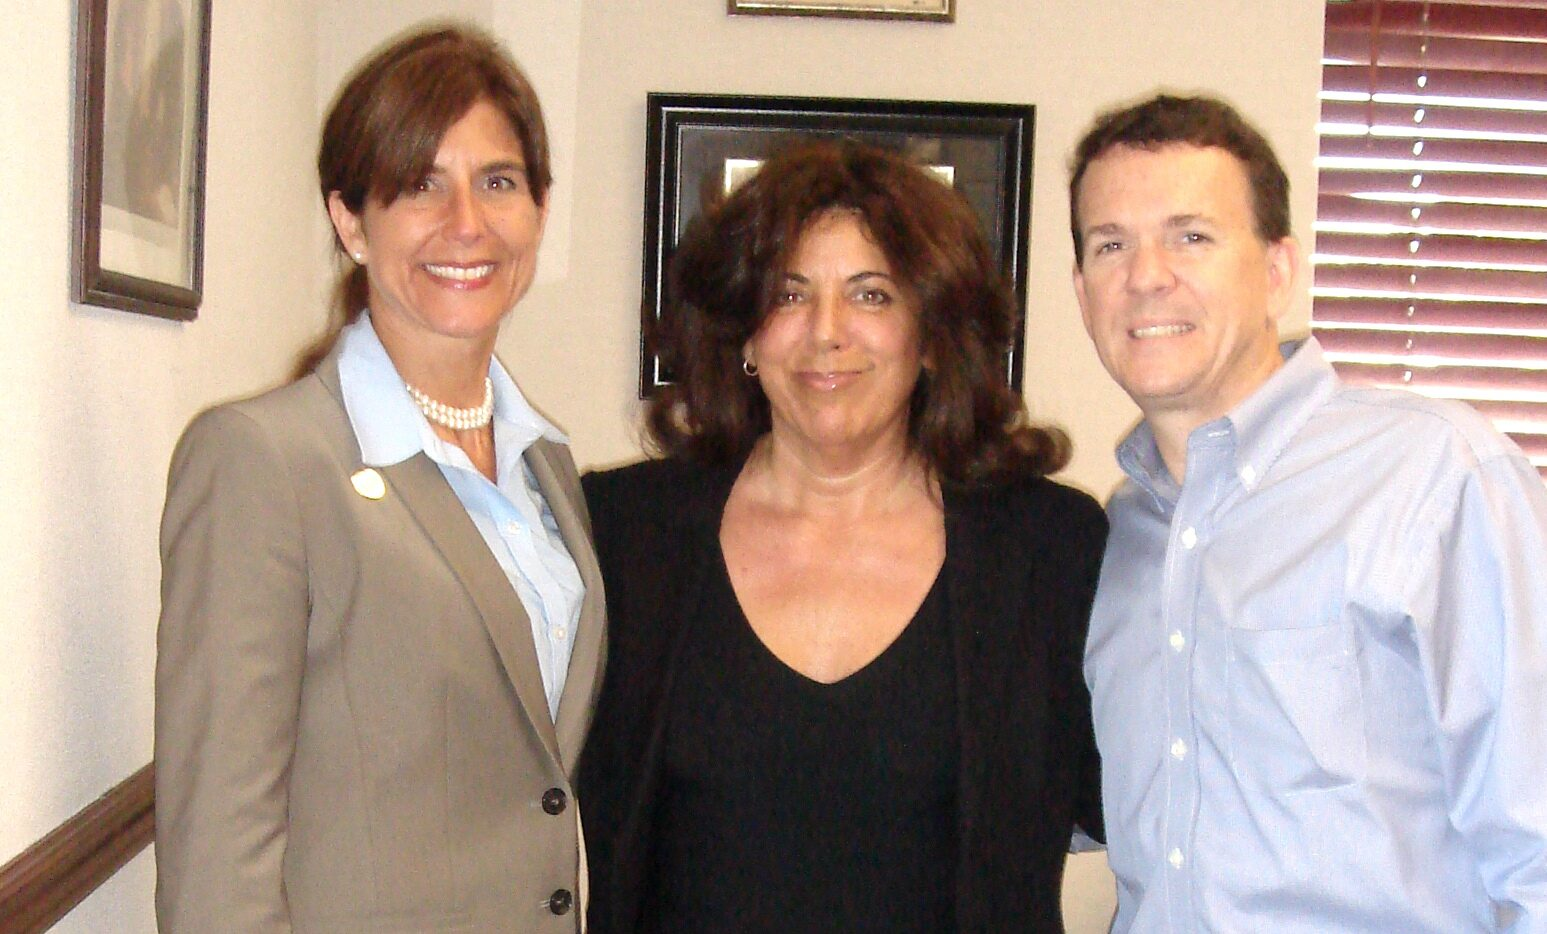 Susan Chana Lask with NJ Senator Beck & Assemblyman O'Scanlon